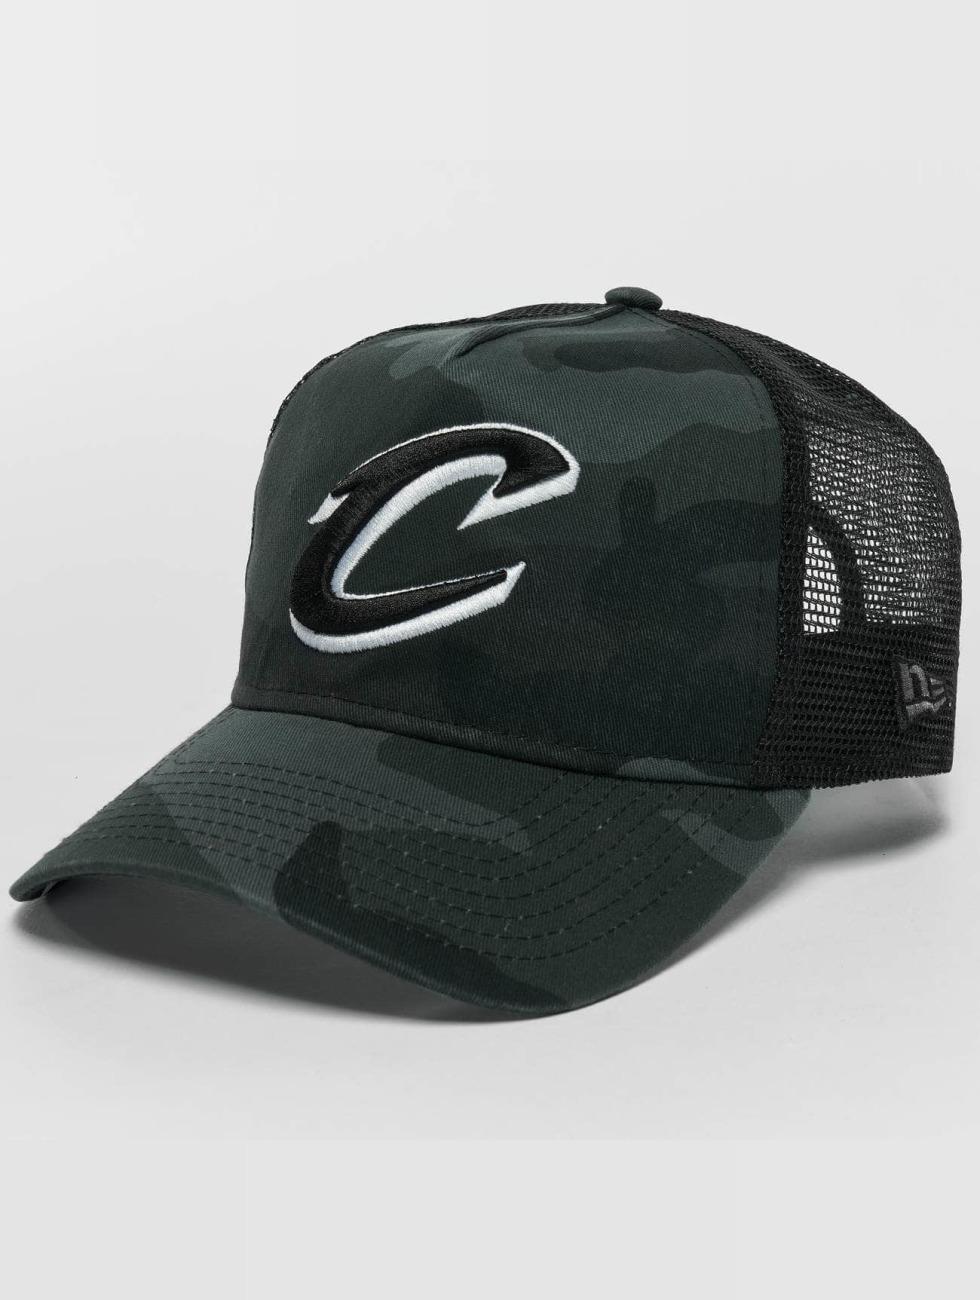 New Era Truckerkeps Washed Camo Cleveland Cavaliers Trucker Cap kamouflage